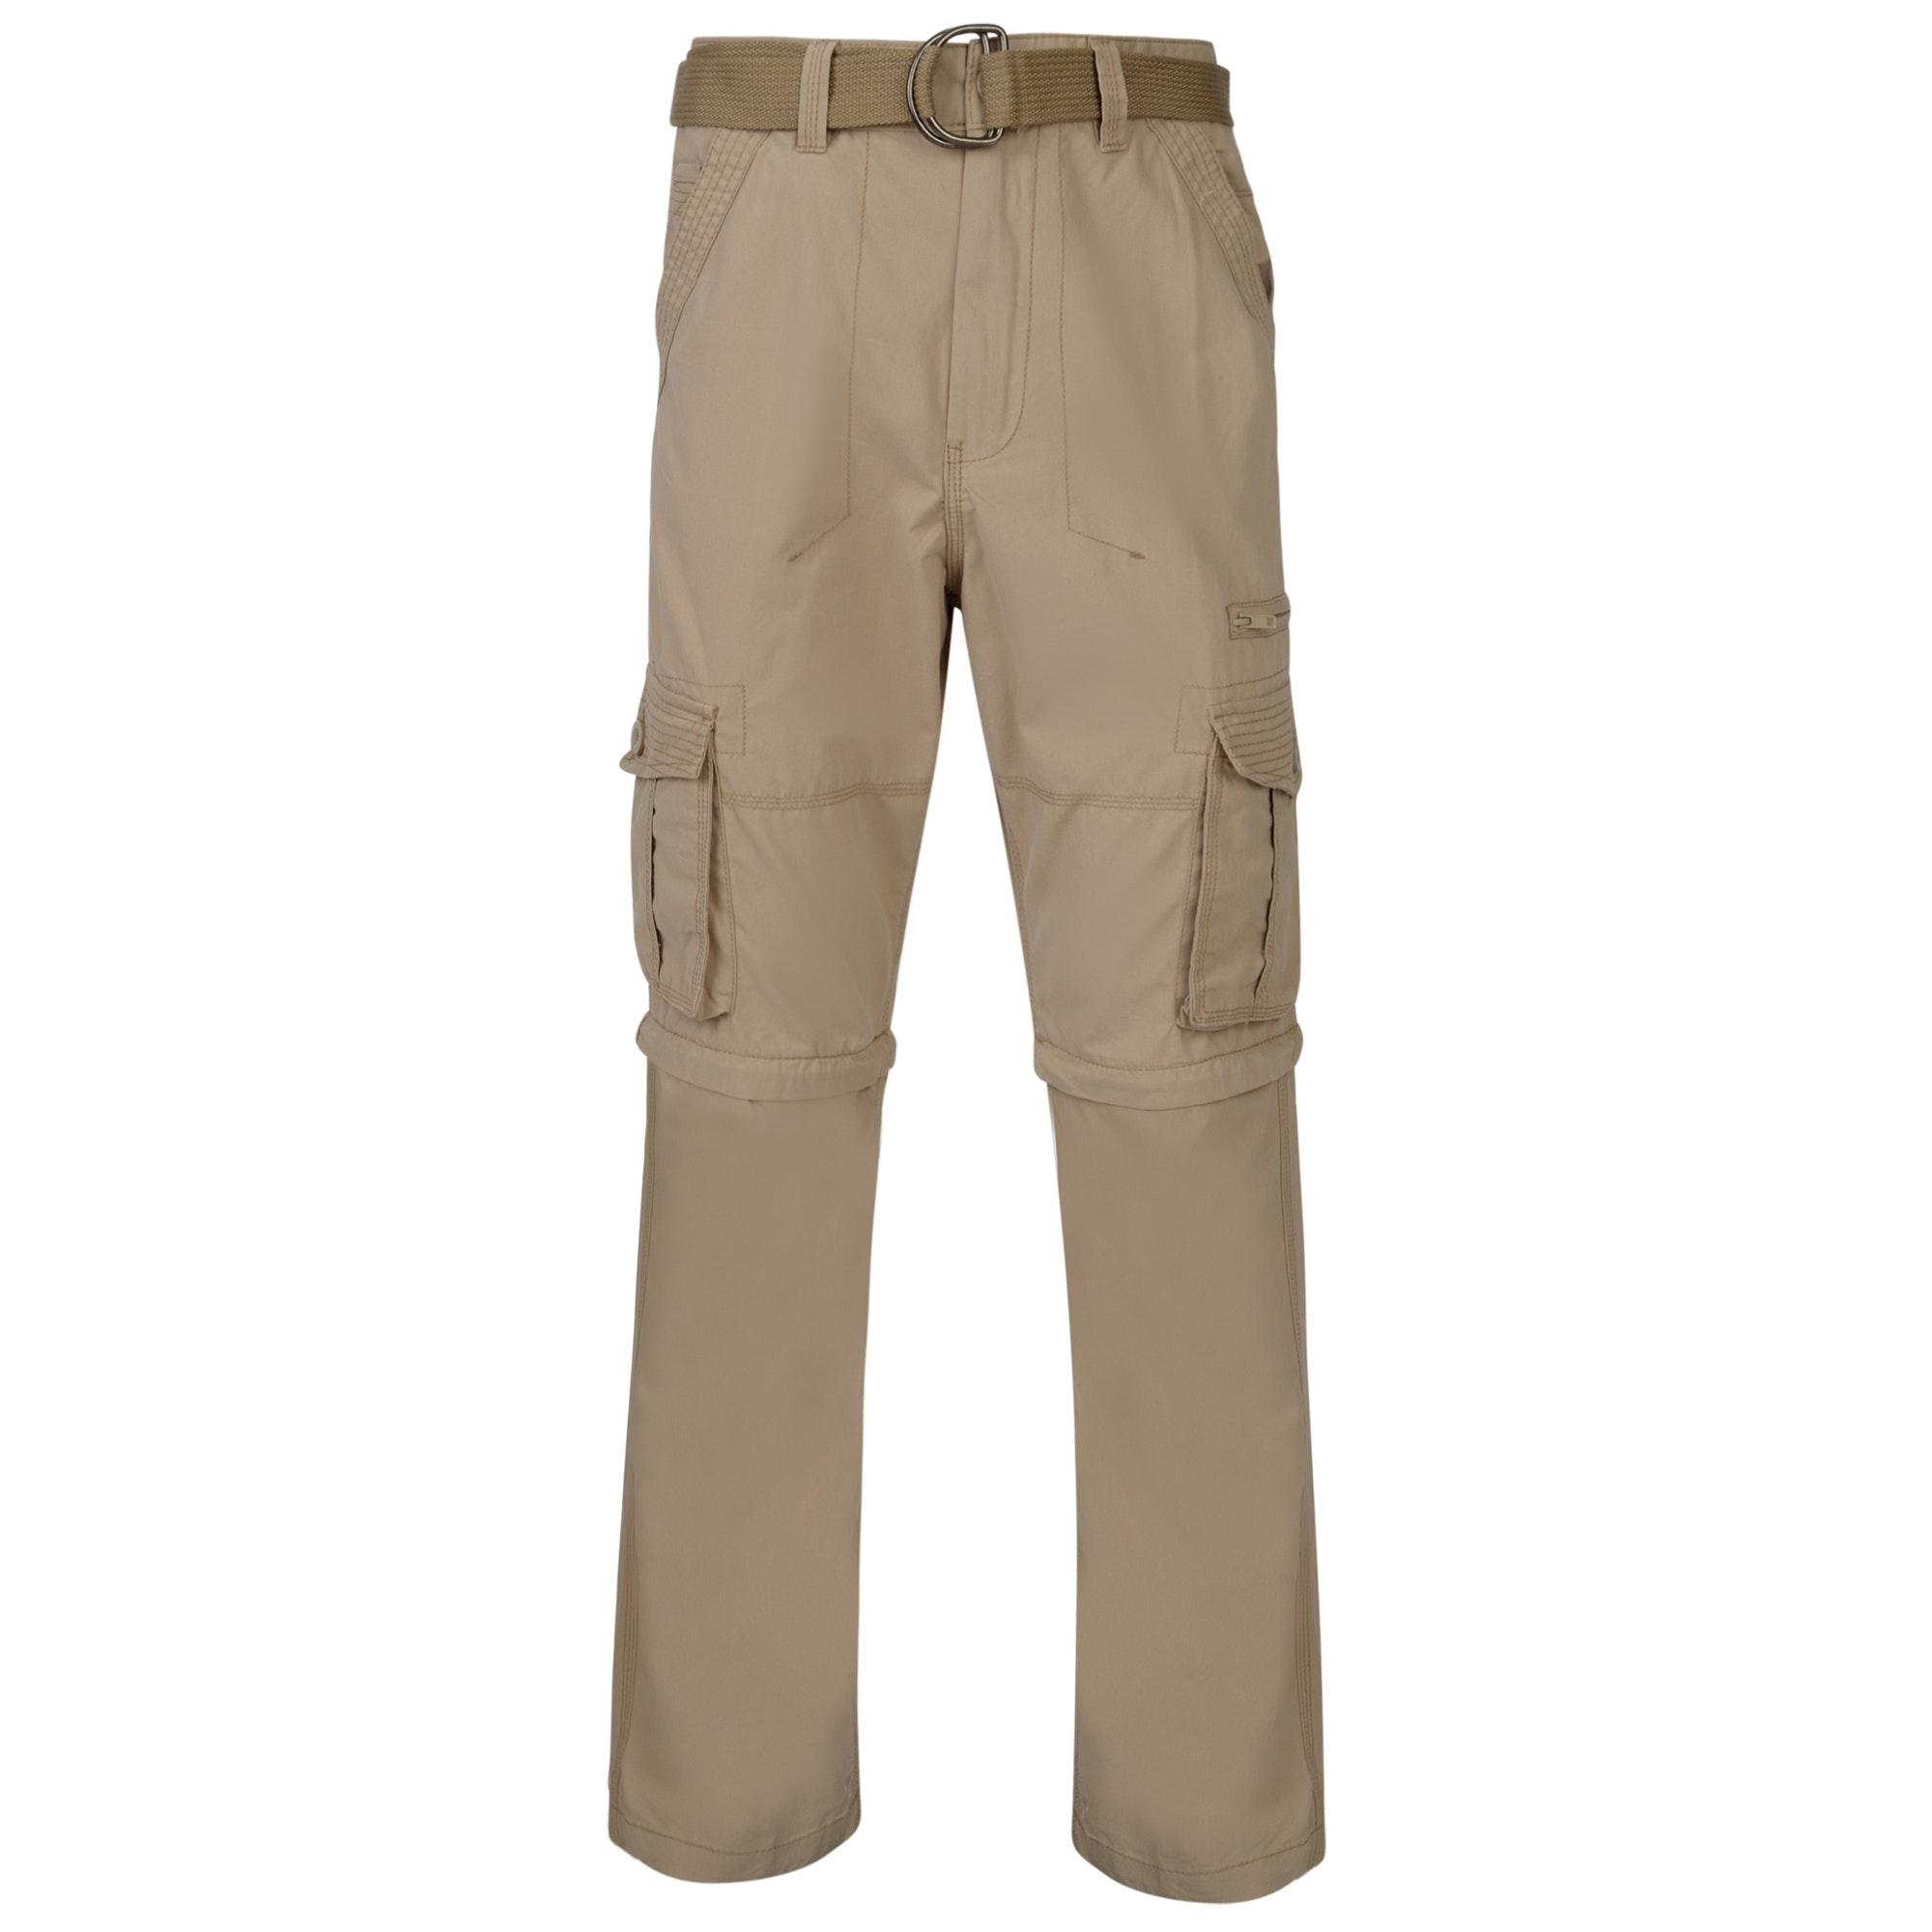 KAM Zip Off Cargo Trousers Stone